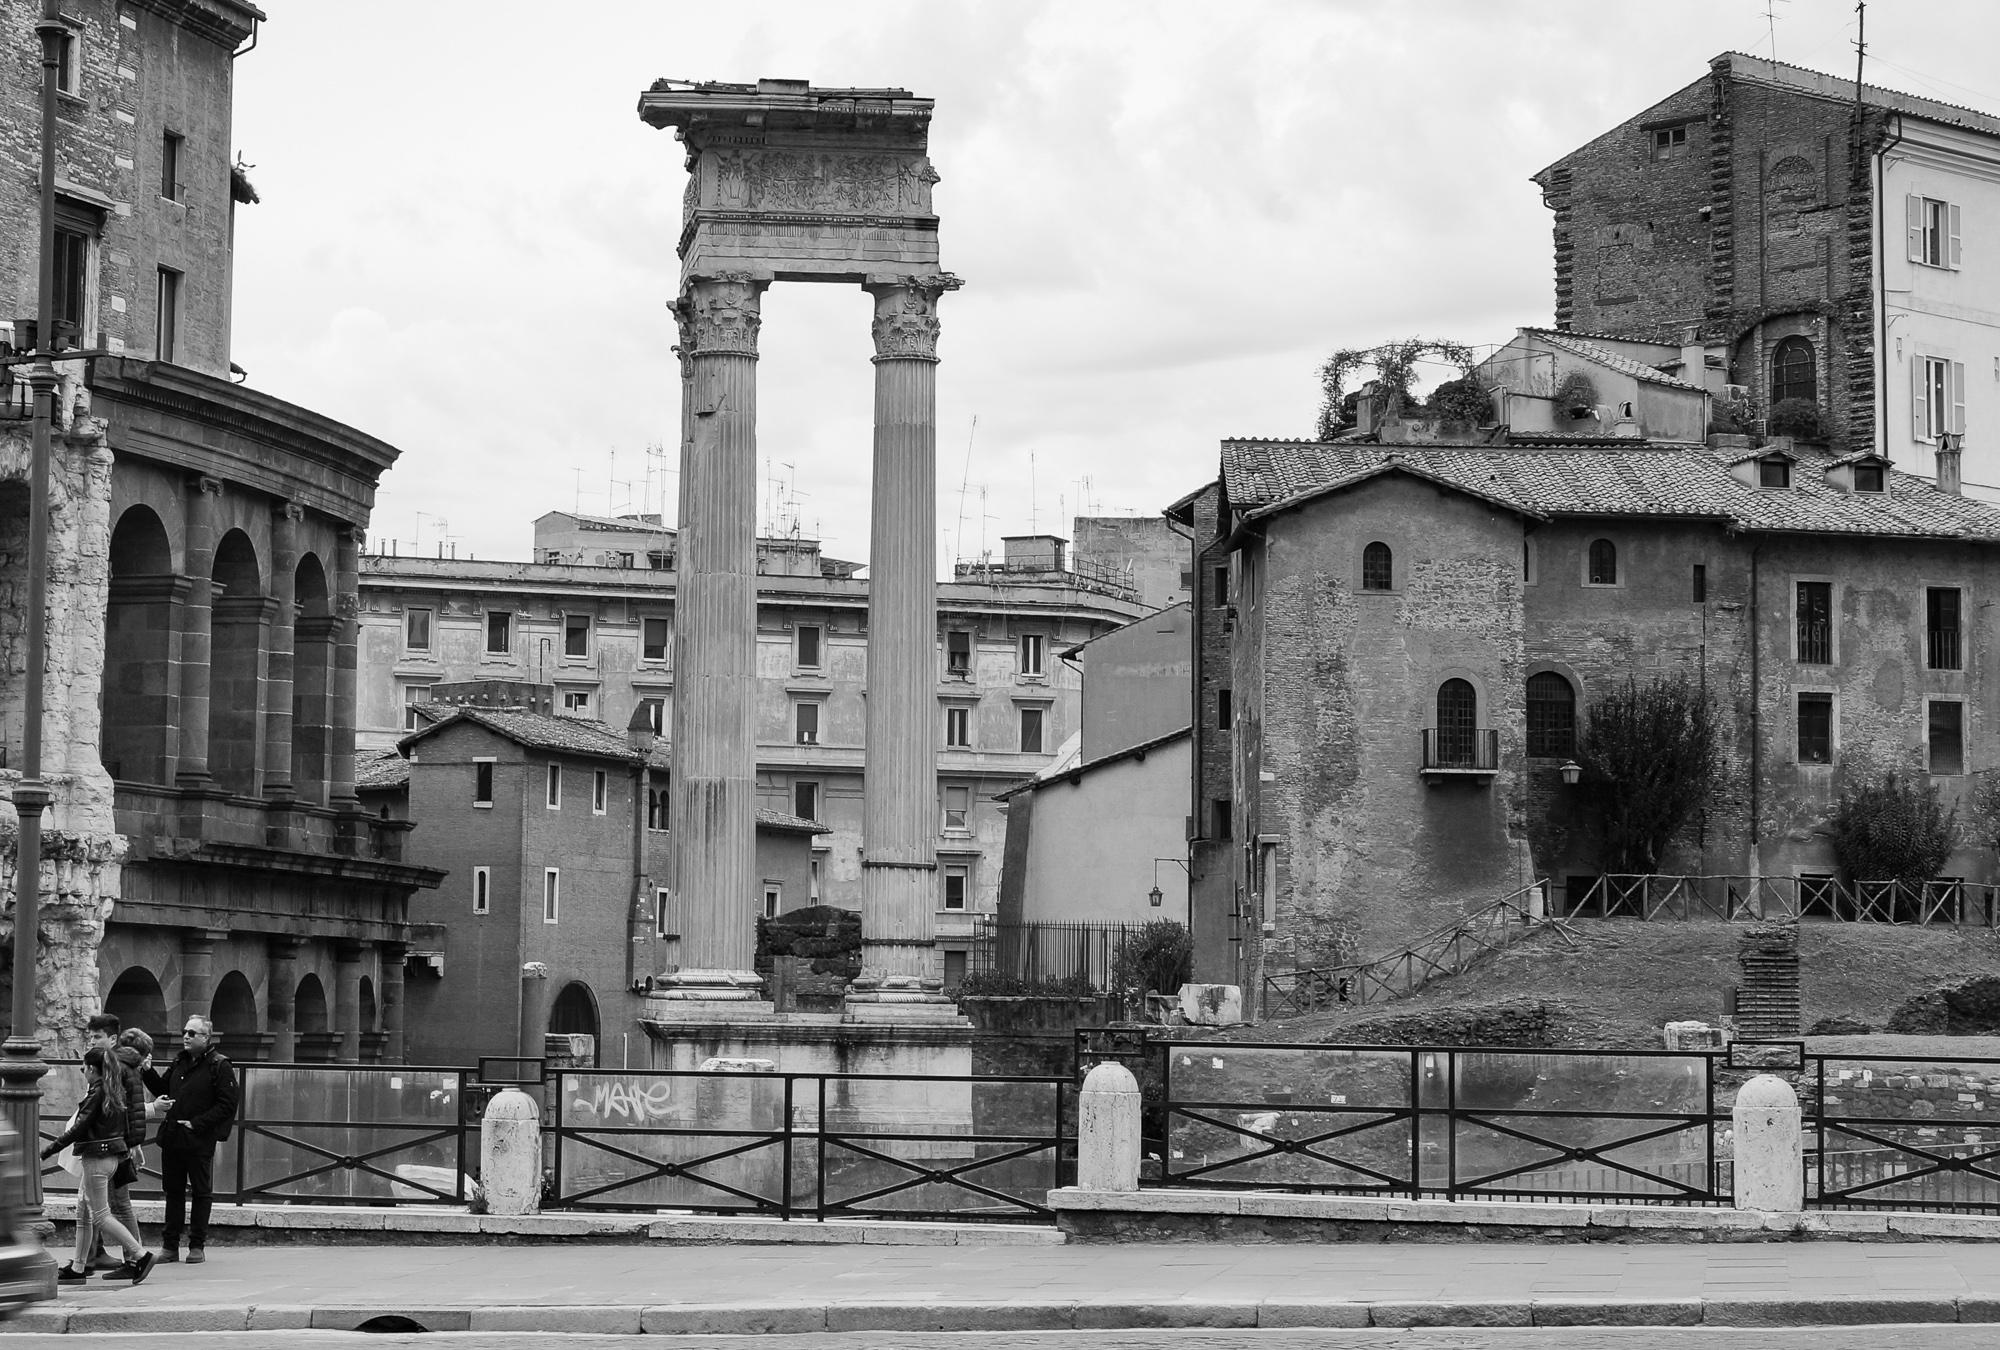 Rome street view, 2018